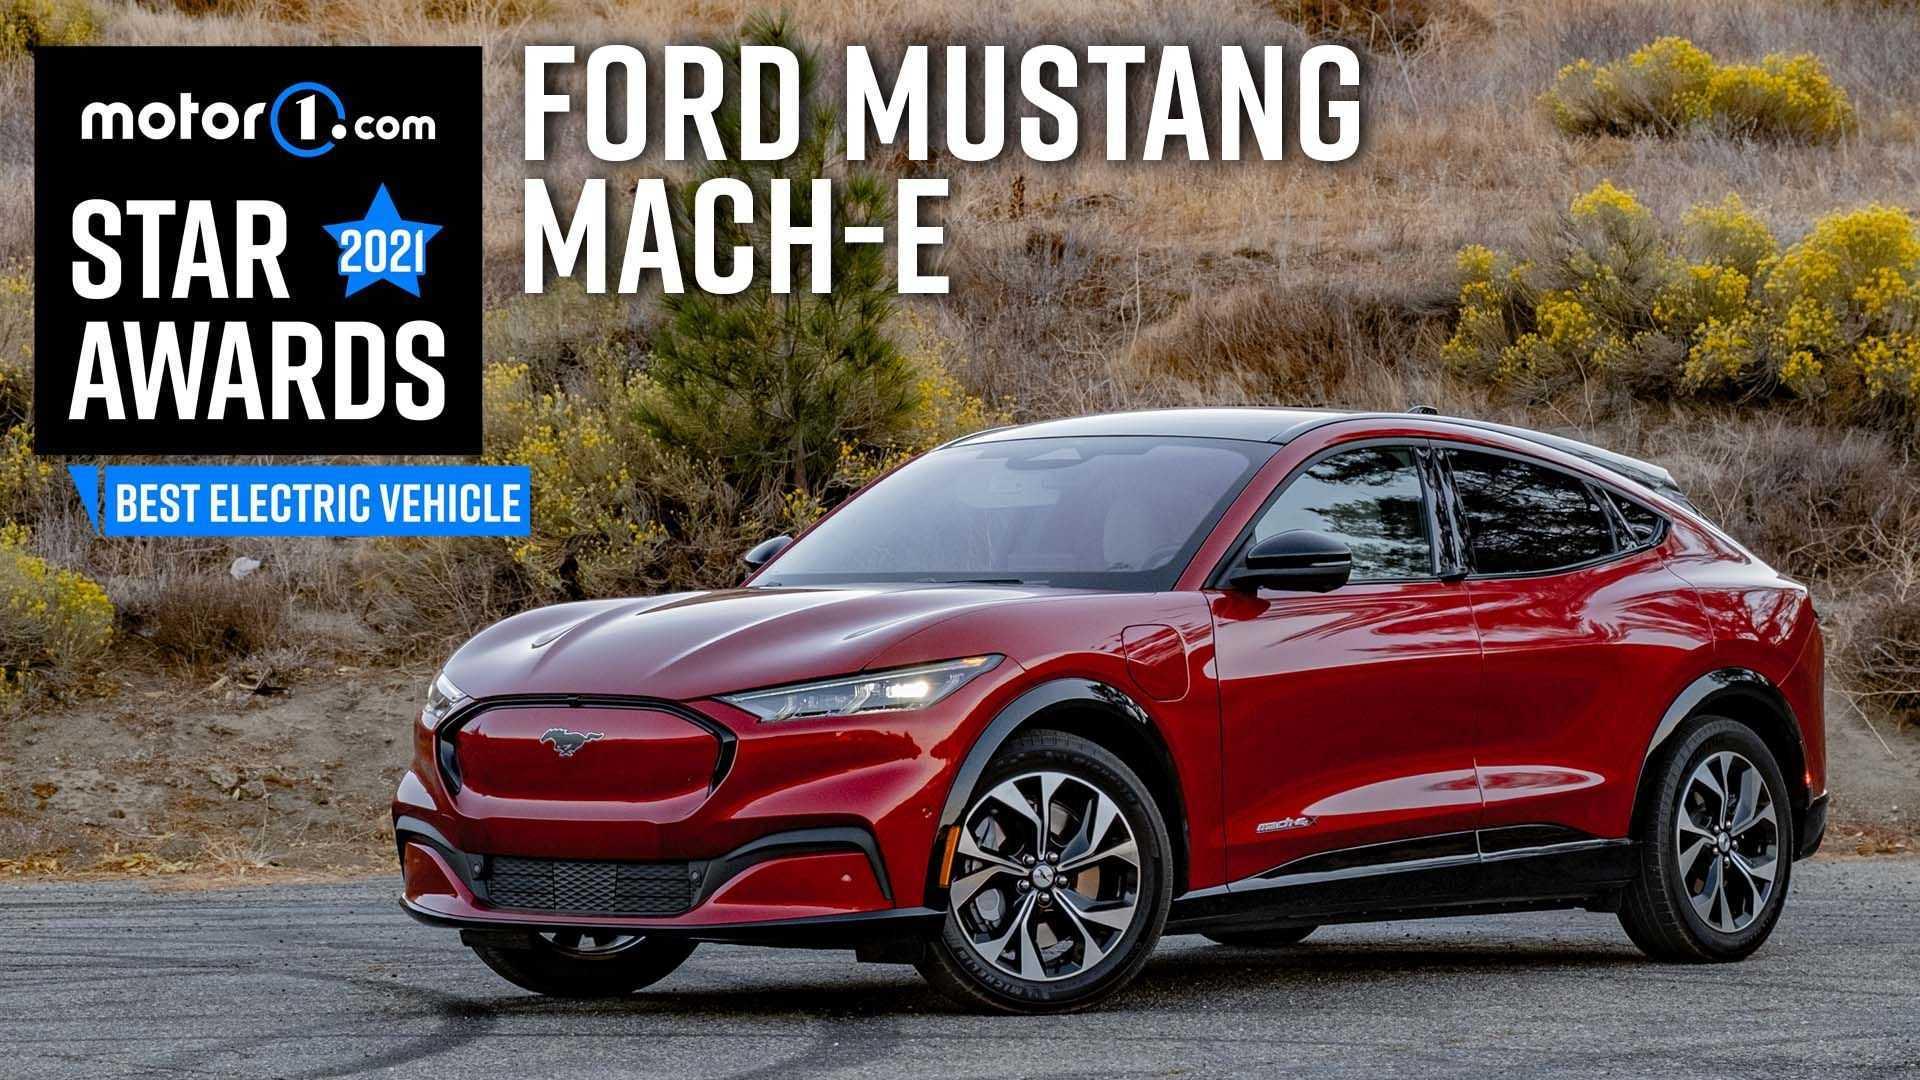 2021 Ford Mustang Mach-E Wins Motor1 Star Award For Best EV